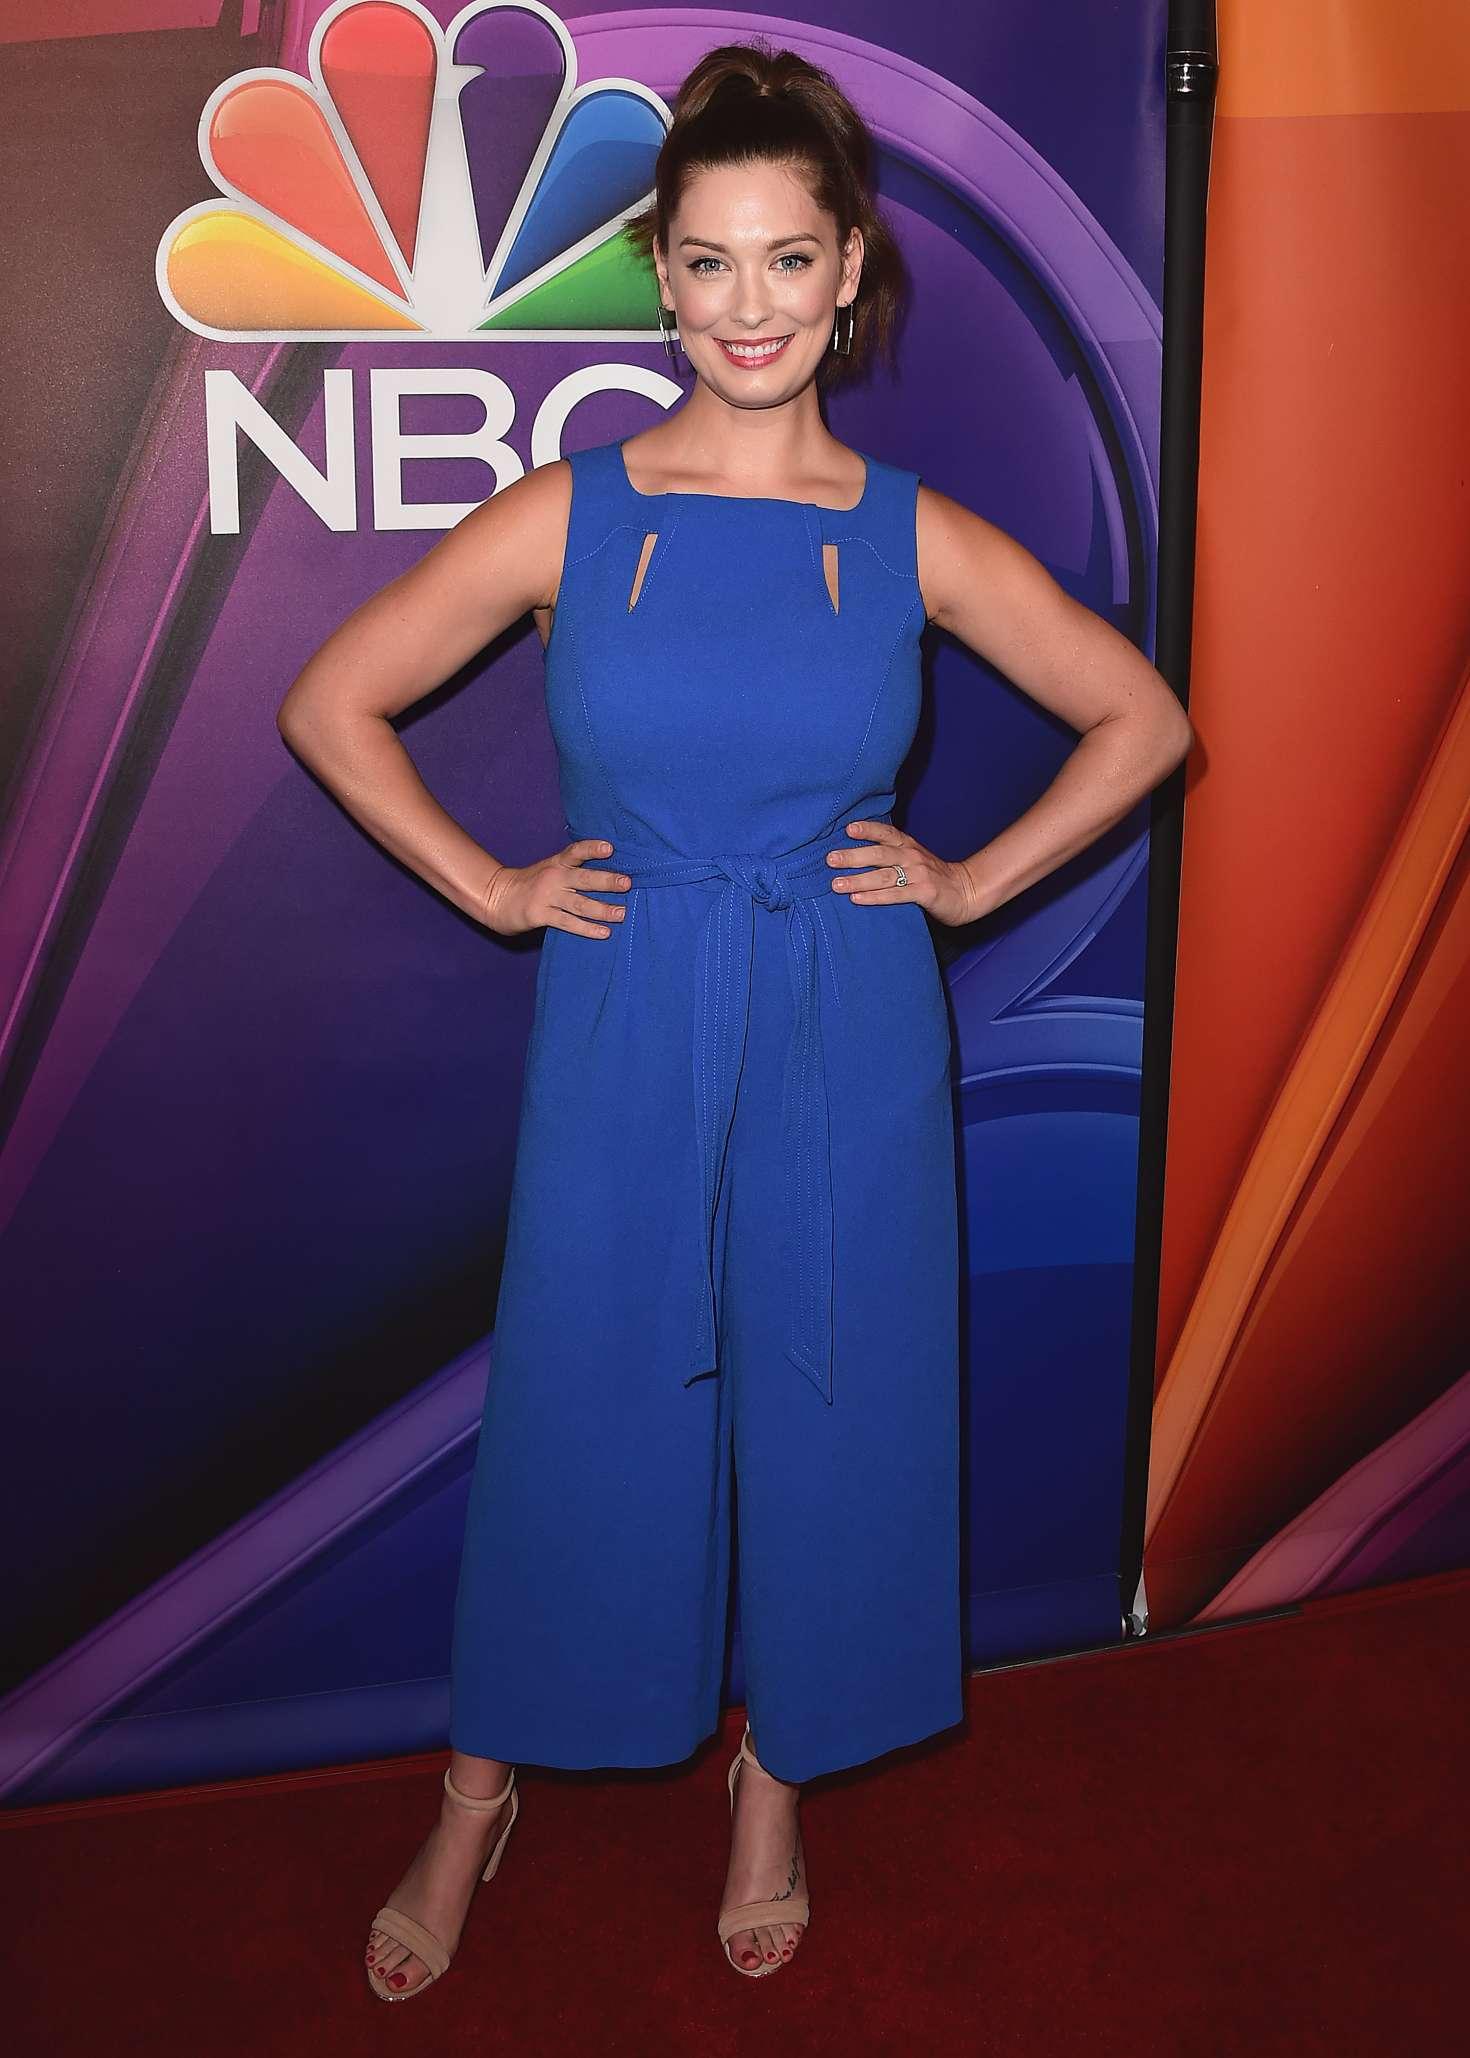 Briga Heelan 2017 : Briga Heelan: 2017 NBC Summer TCA Press Tour -12